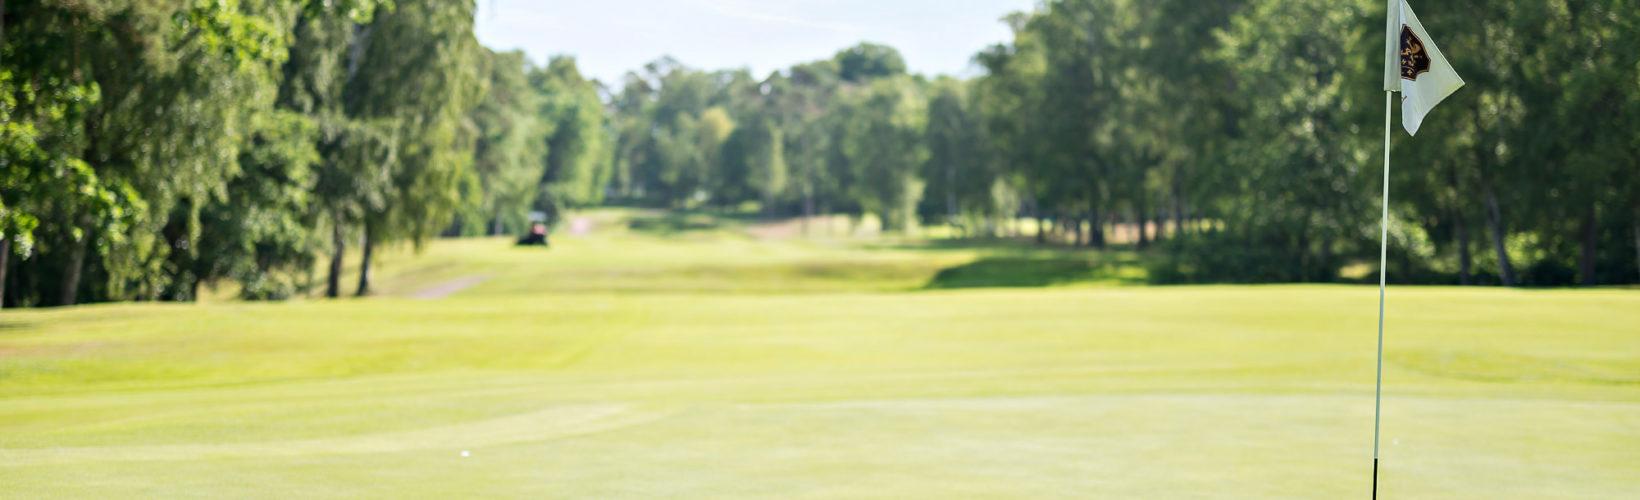 Golfa i Tylösand